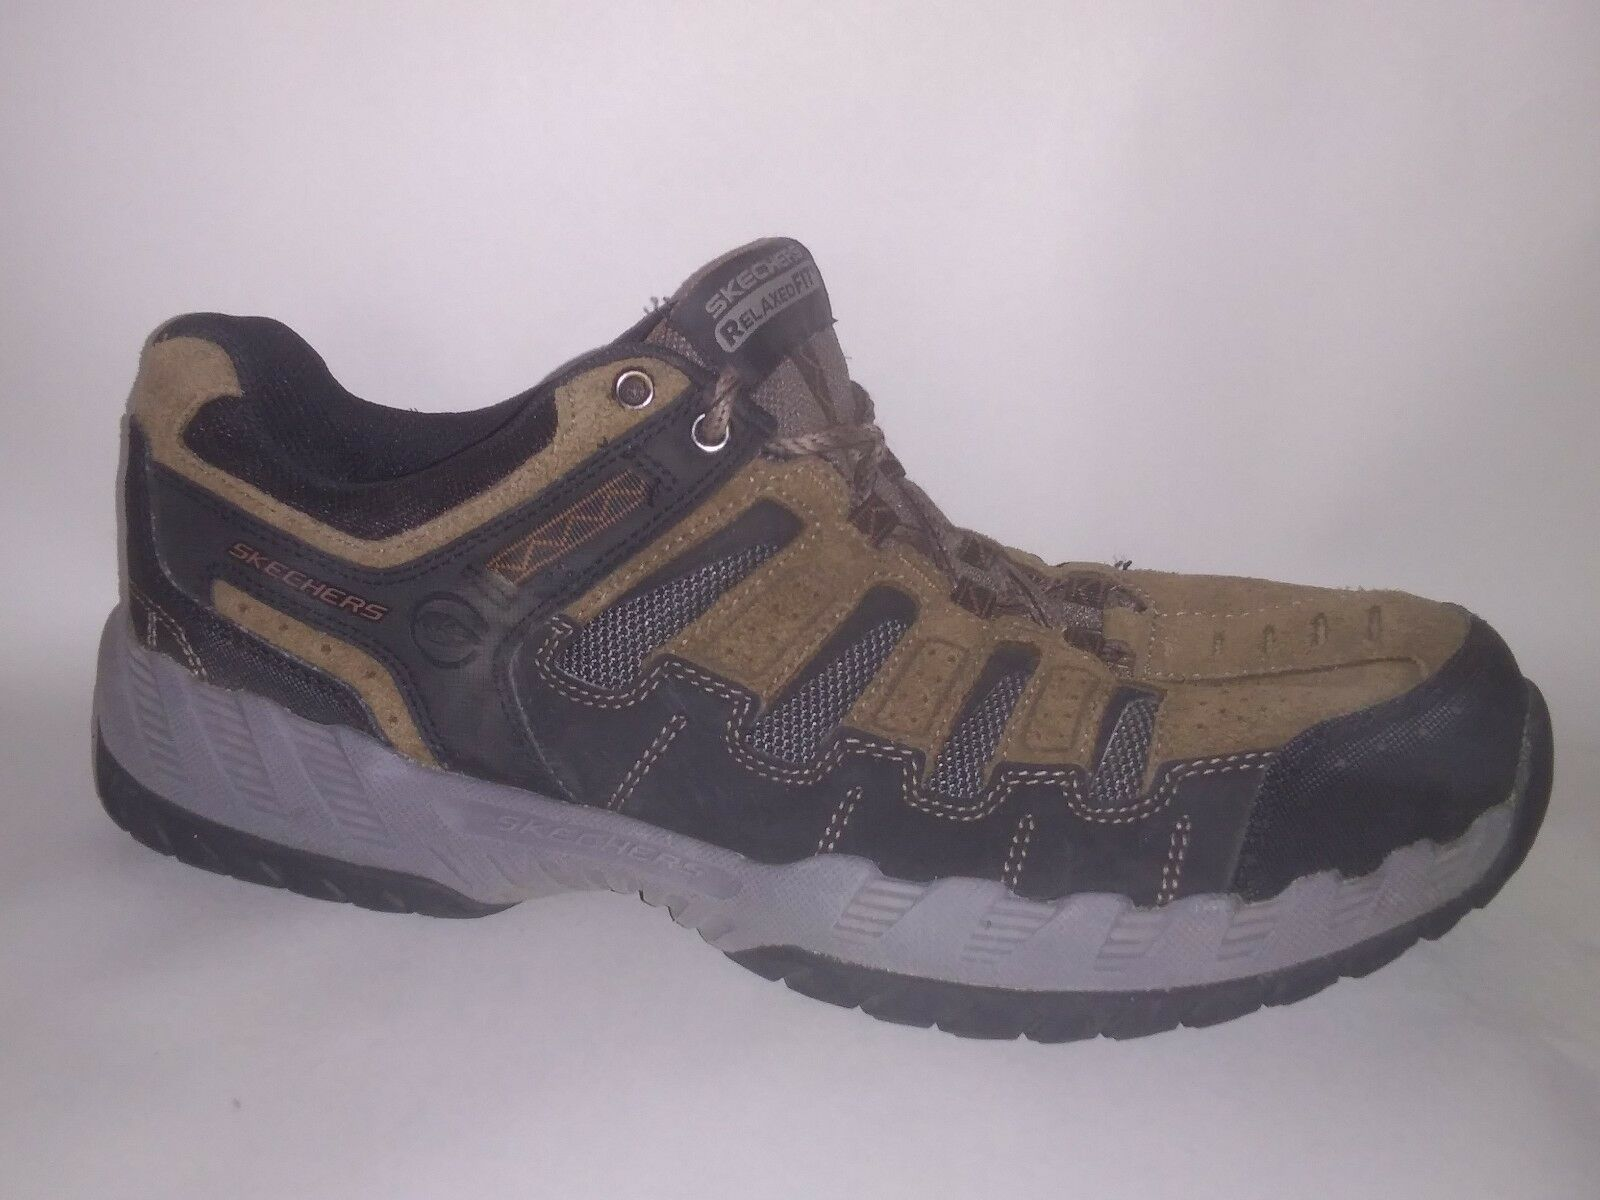 Skechers 51384 Thrill Seeker Gel Memory Foam Brown Black Mens 10 M Shoes Sneaker The most popular shoes for men and women